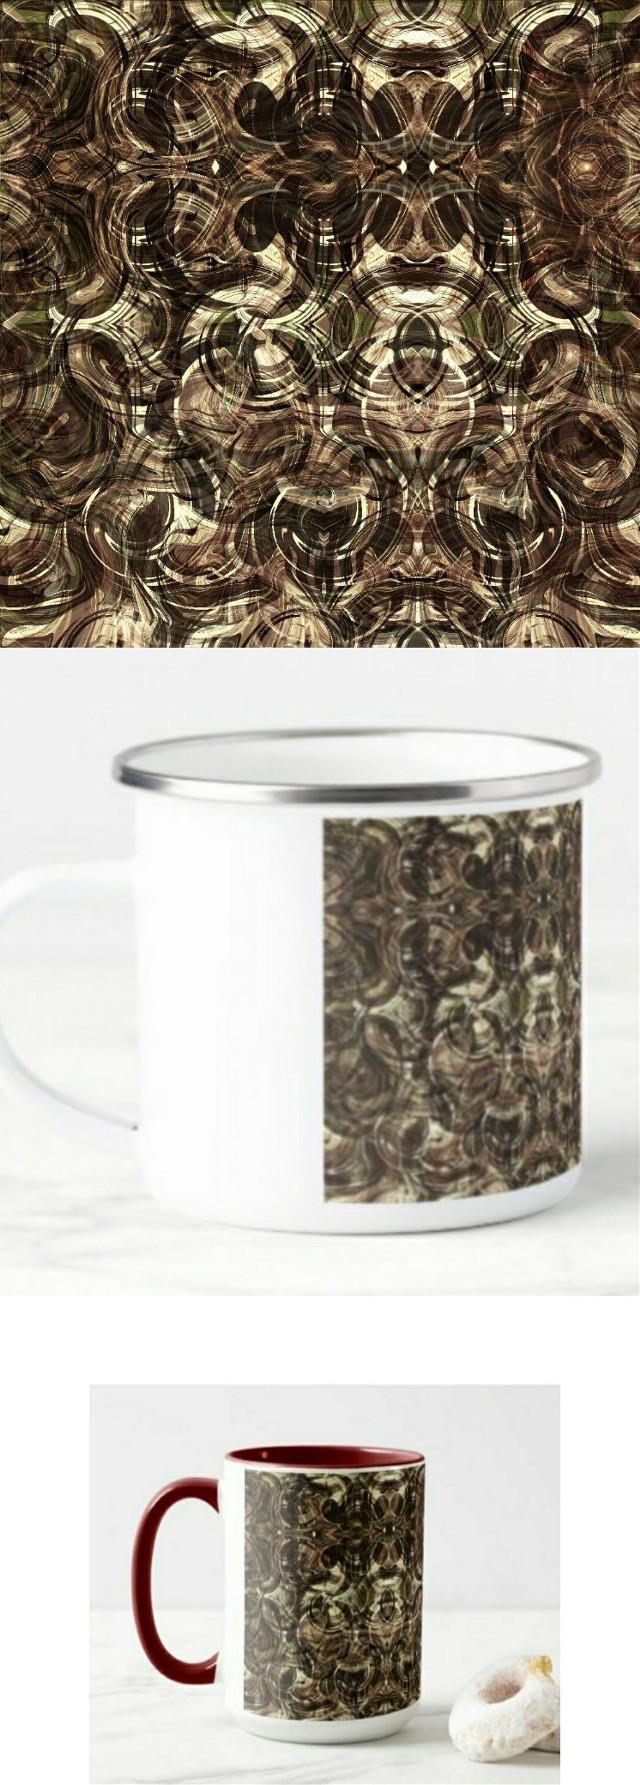 #freetoedit #mug #mugs #coffeemug #craft #crafts #mydesign